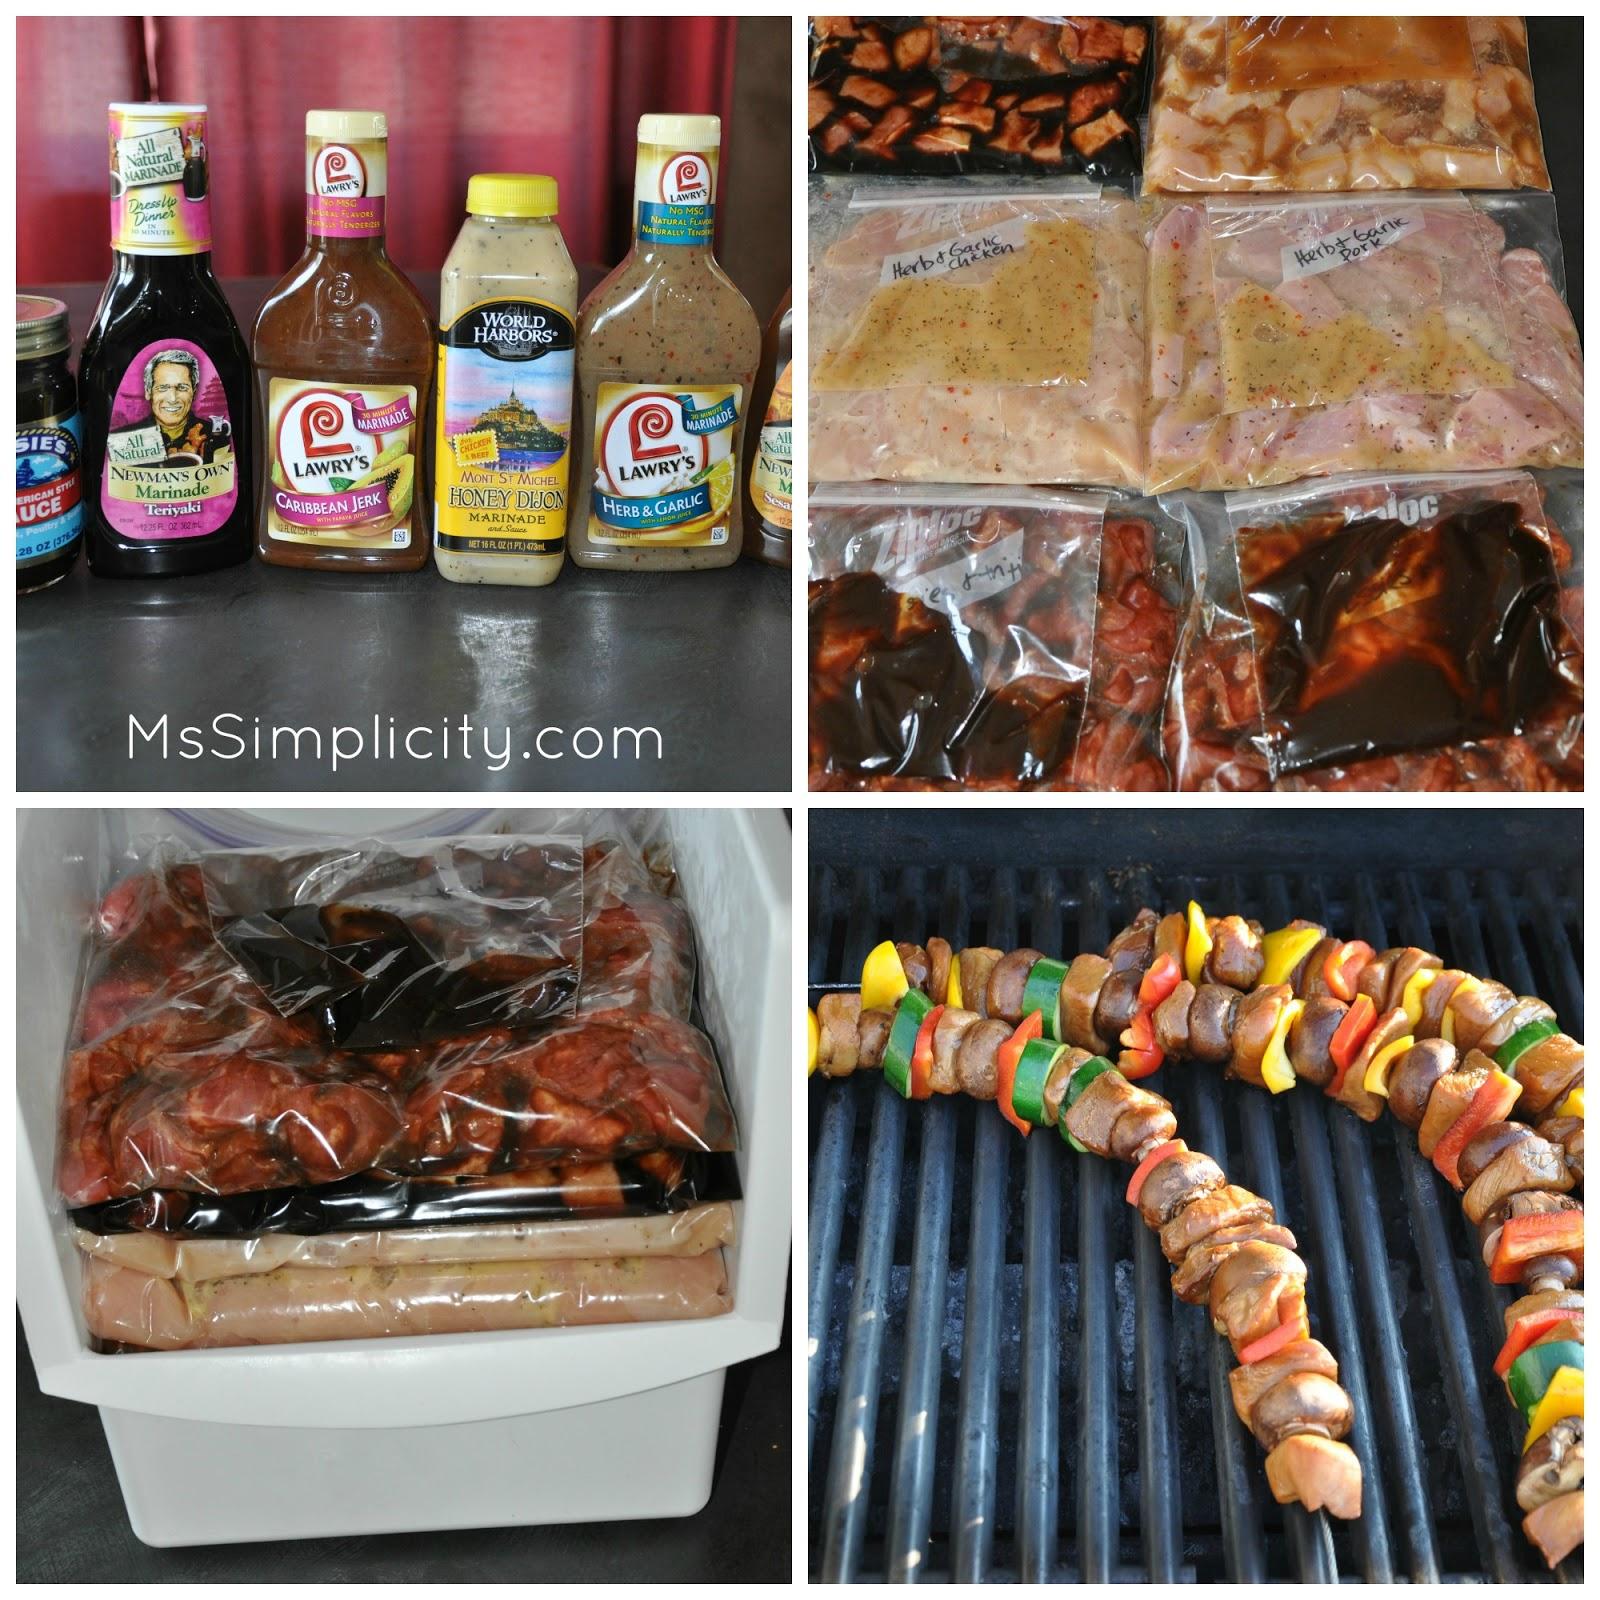 Ms simplicity easy summer freezer meals part 2